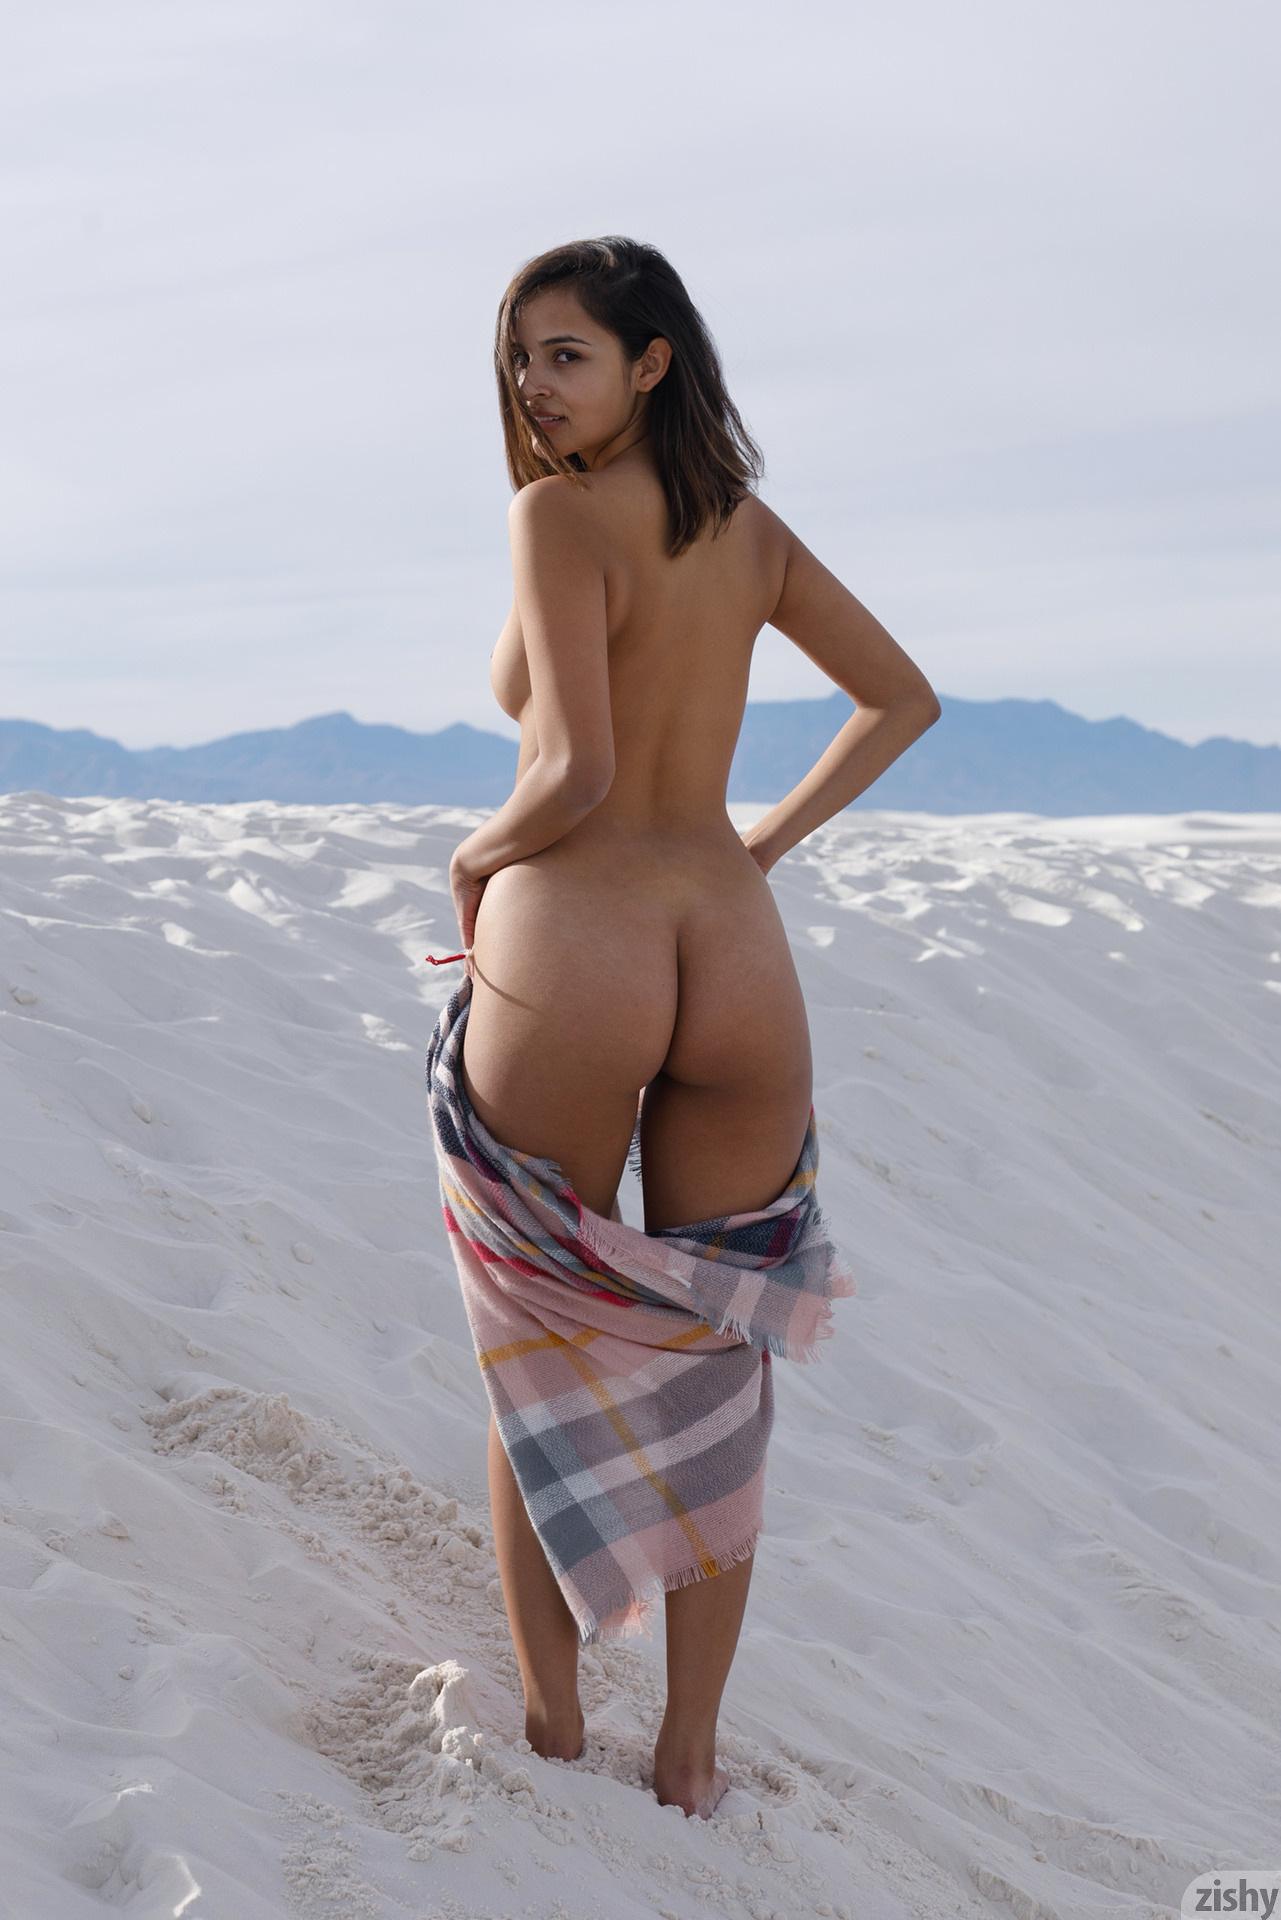 Alejandra Cobos White Sands 3 Zishy (3)